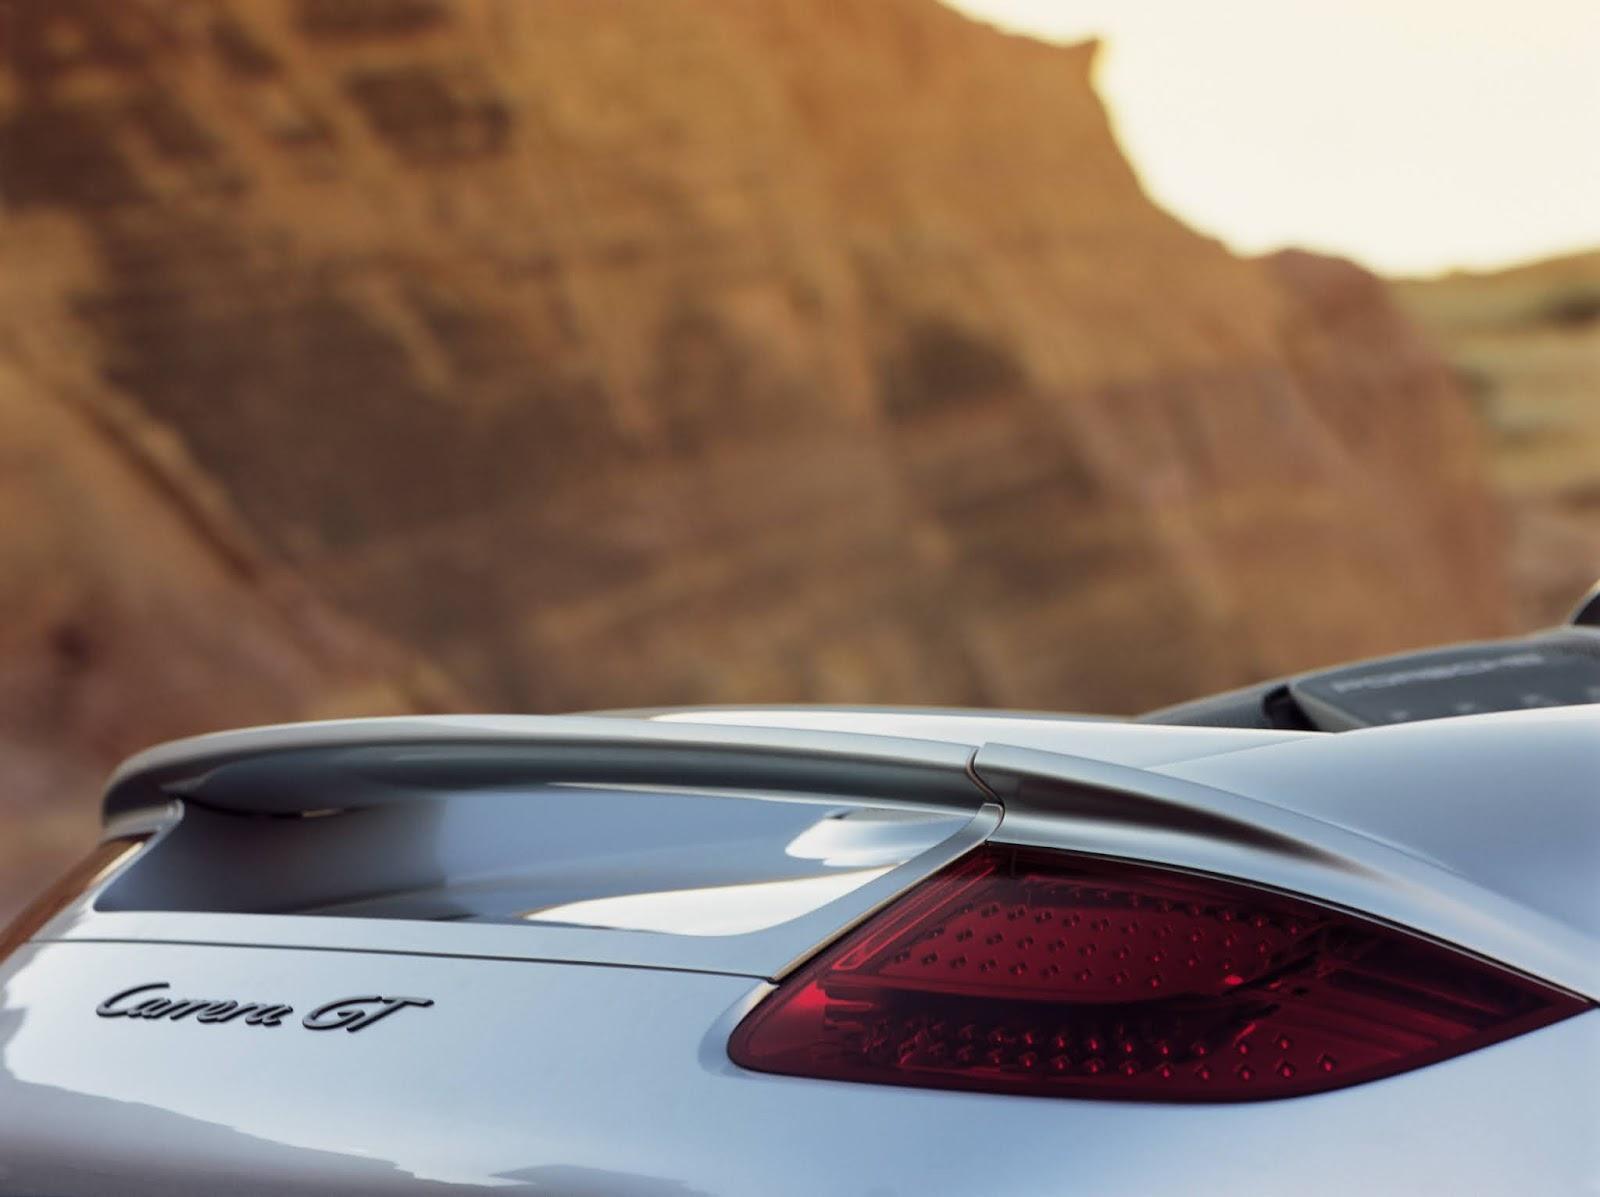 P01 0329 a4 Porsche Carrera GT : Ένα αγωνιστικό LeMans, για το δρόμο Carrera GT, Porsche, Porsche Carrera GT, retrocar, retrocar sunday, supercar, zblog